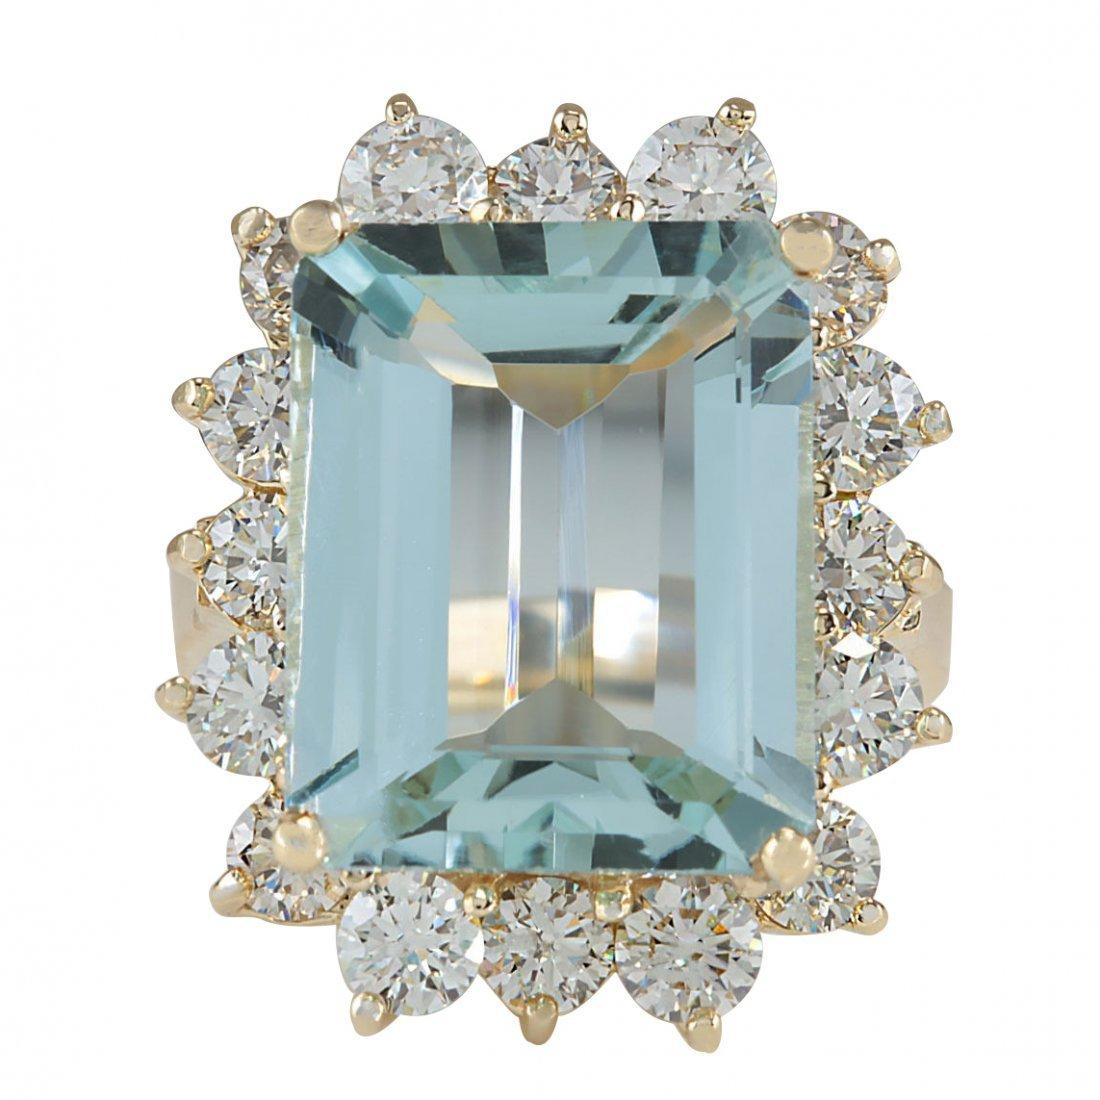 12.57CTW Natural Aquamarine And Diamond Ring In 14K